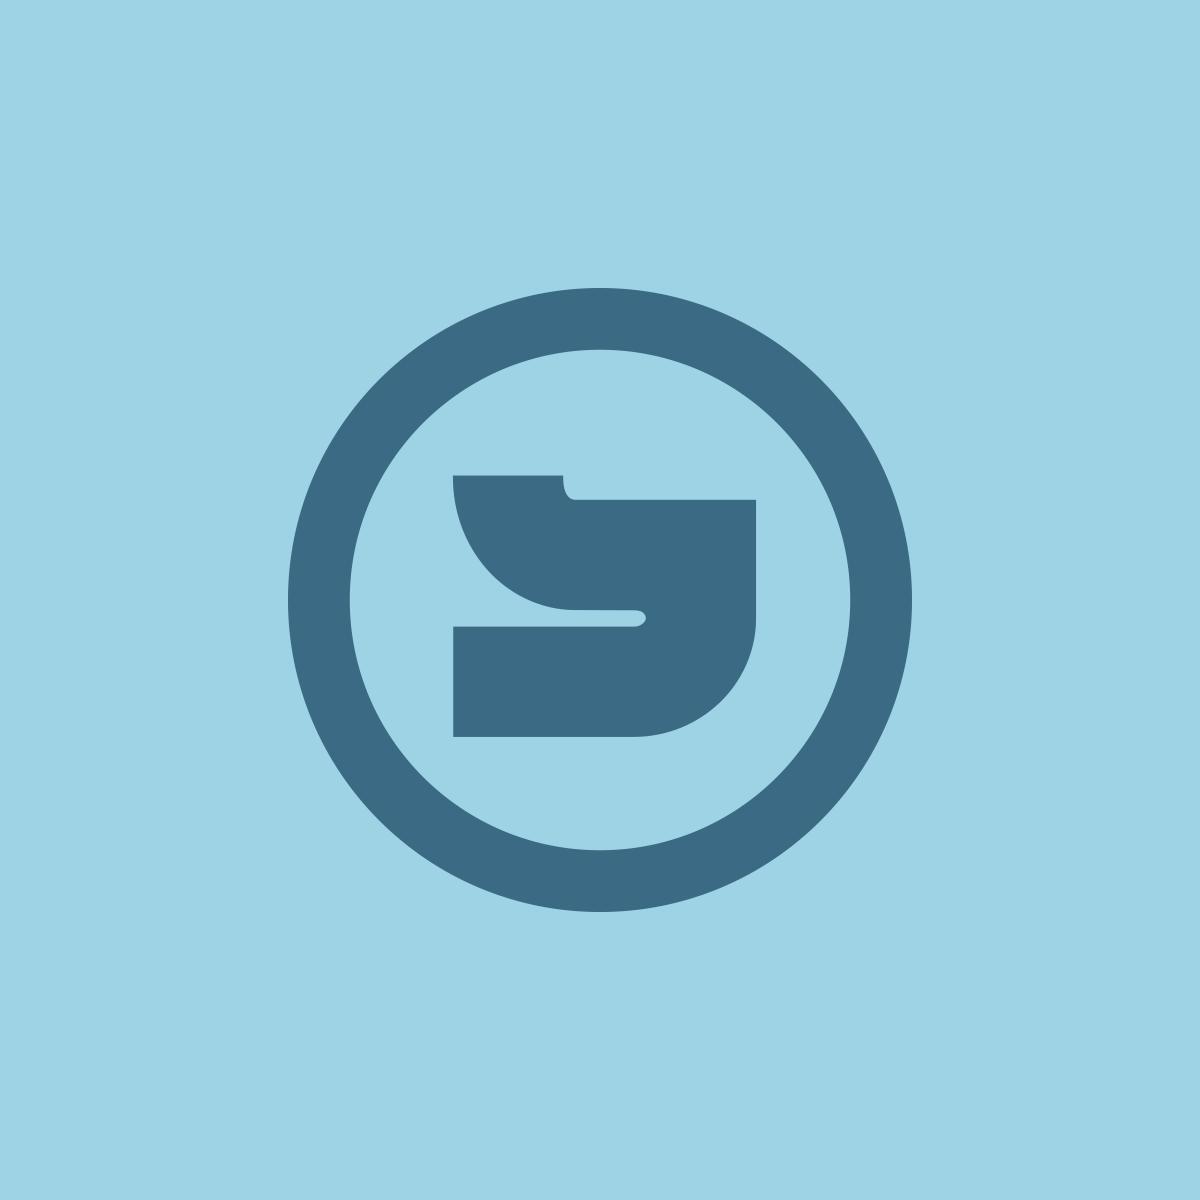 Combo pack: 3x HIIT part 1,2,3